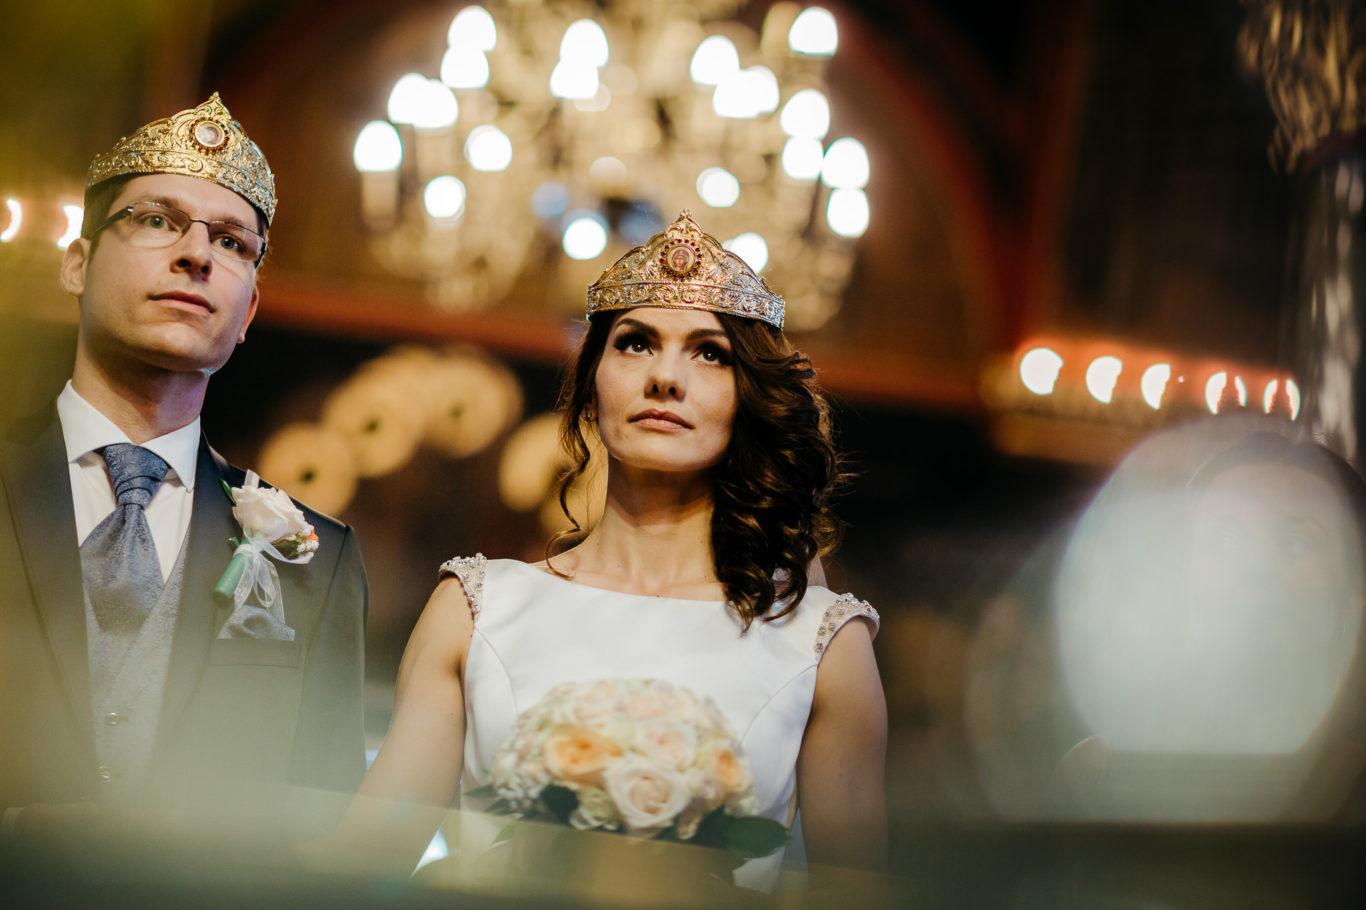 0462-fotografie-nunta-bucuresti-dana-radu-fotograf-ciprian-dumitrescu-cd2_7425